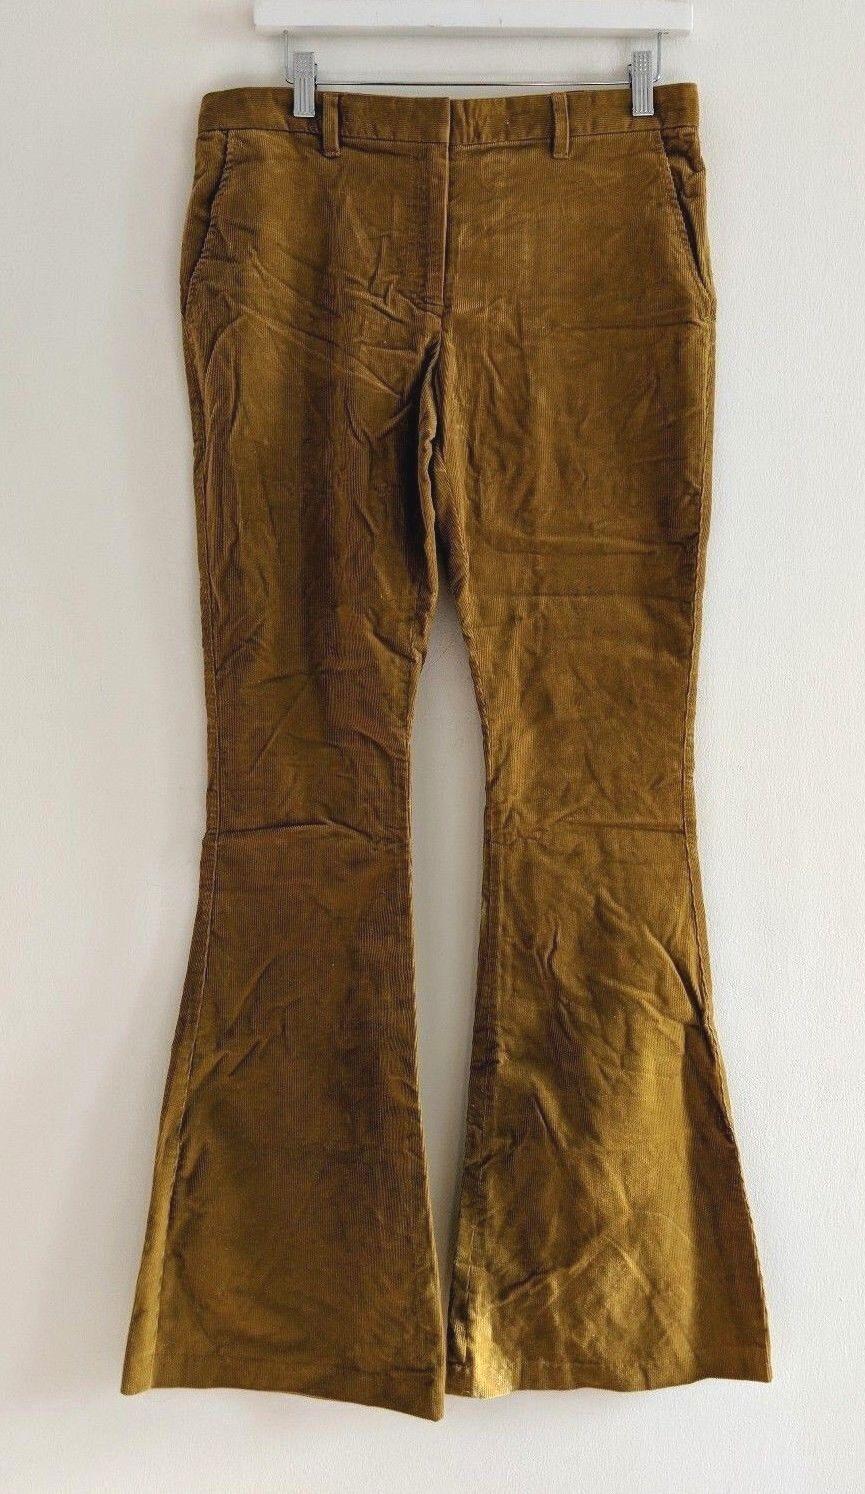 The Row Mustard Yellow Flare Corduroy Pants Sz 4 NWT  610